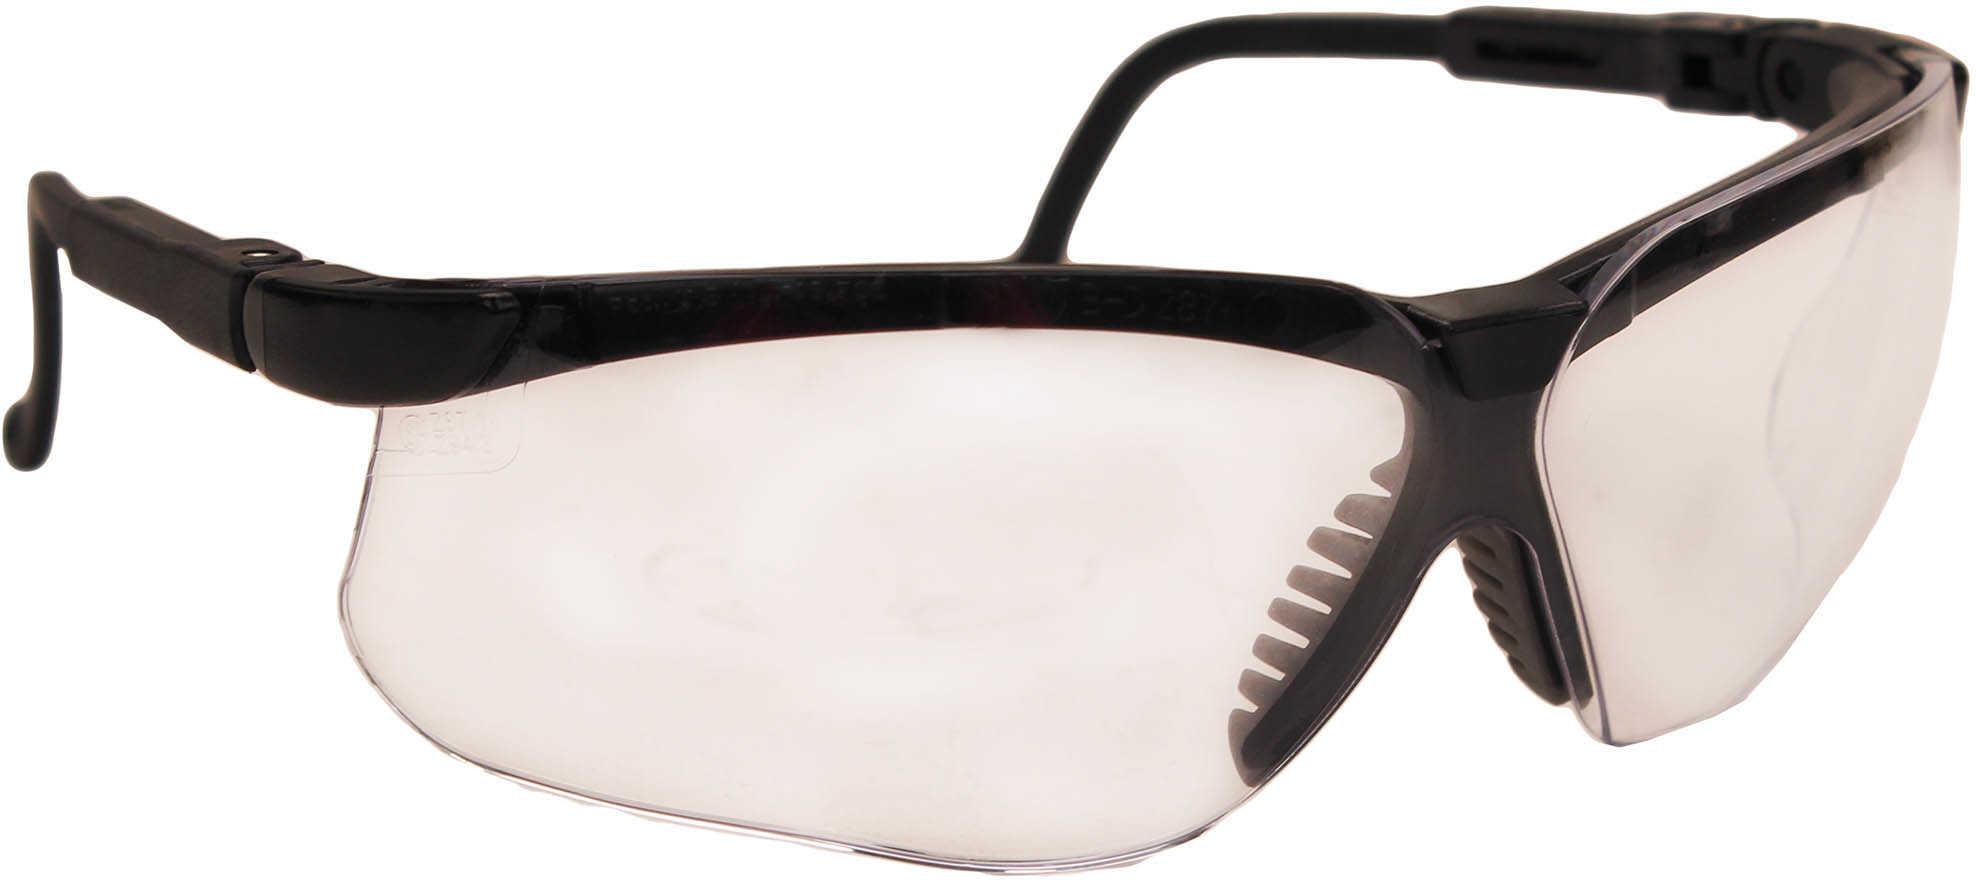 Howard Leight Industries Uvex Genesis Black Frame - Clear Lens Impact resistant polycarbonate lens block 99.9% UVA & UVB - So R03570